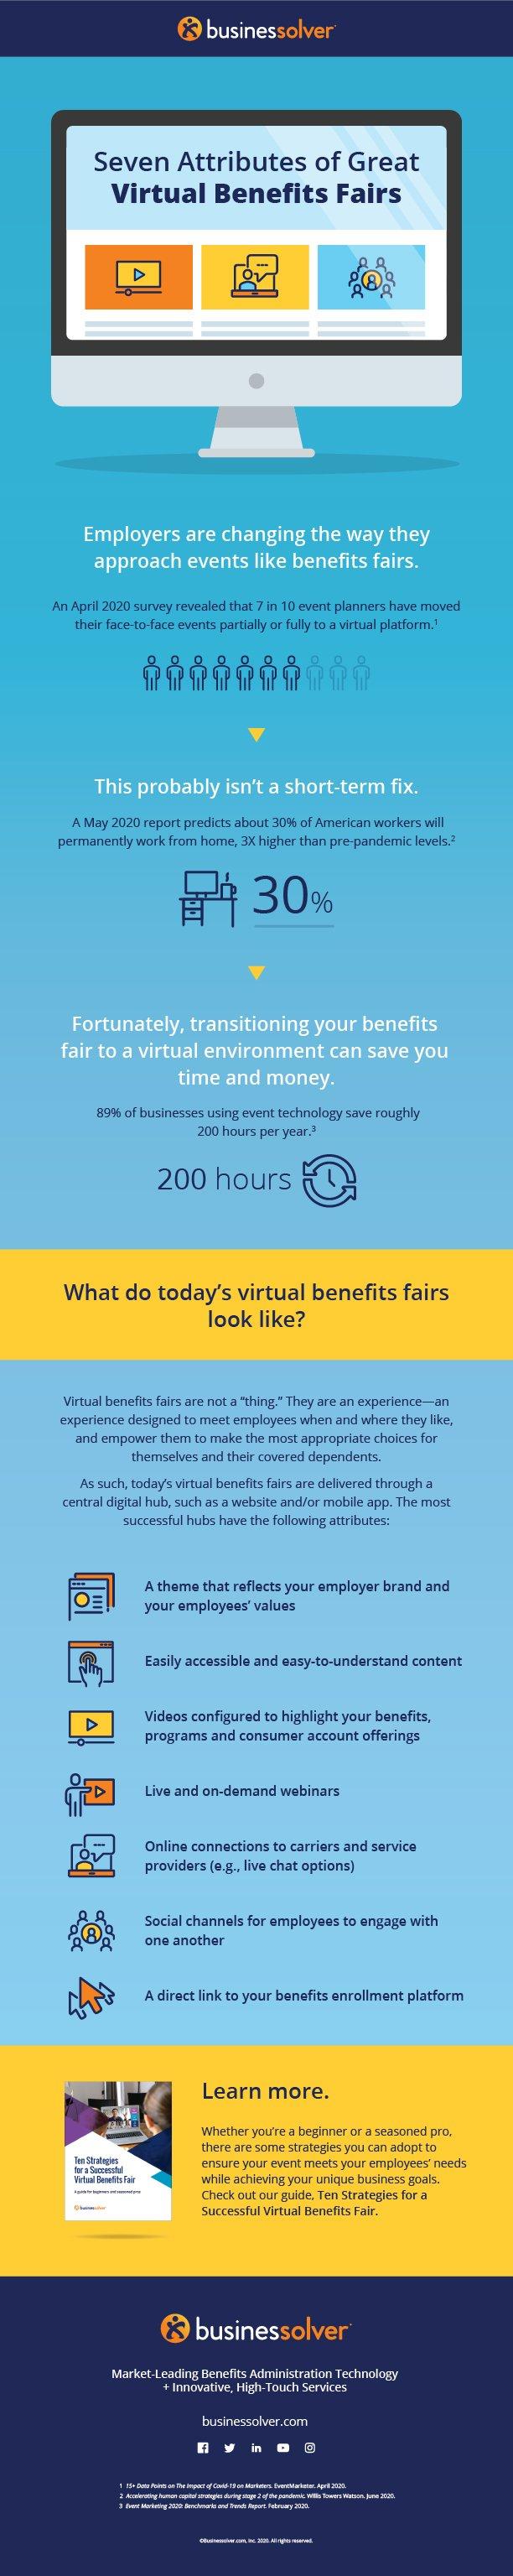 full-image-virtual-fairs-infographic